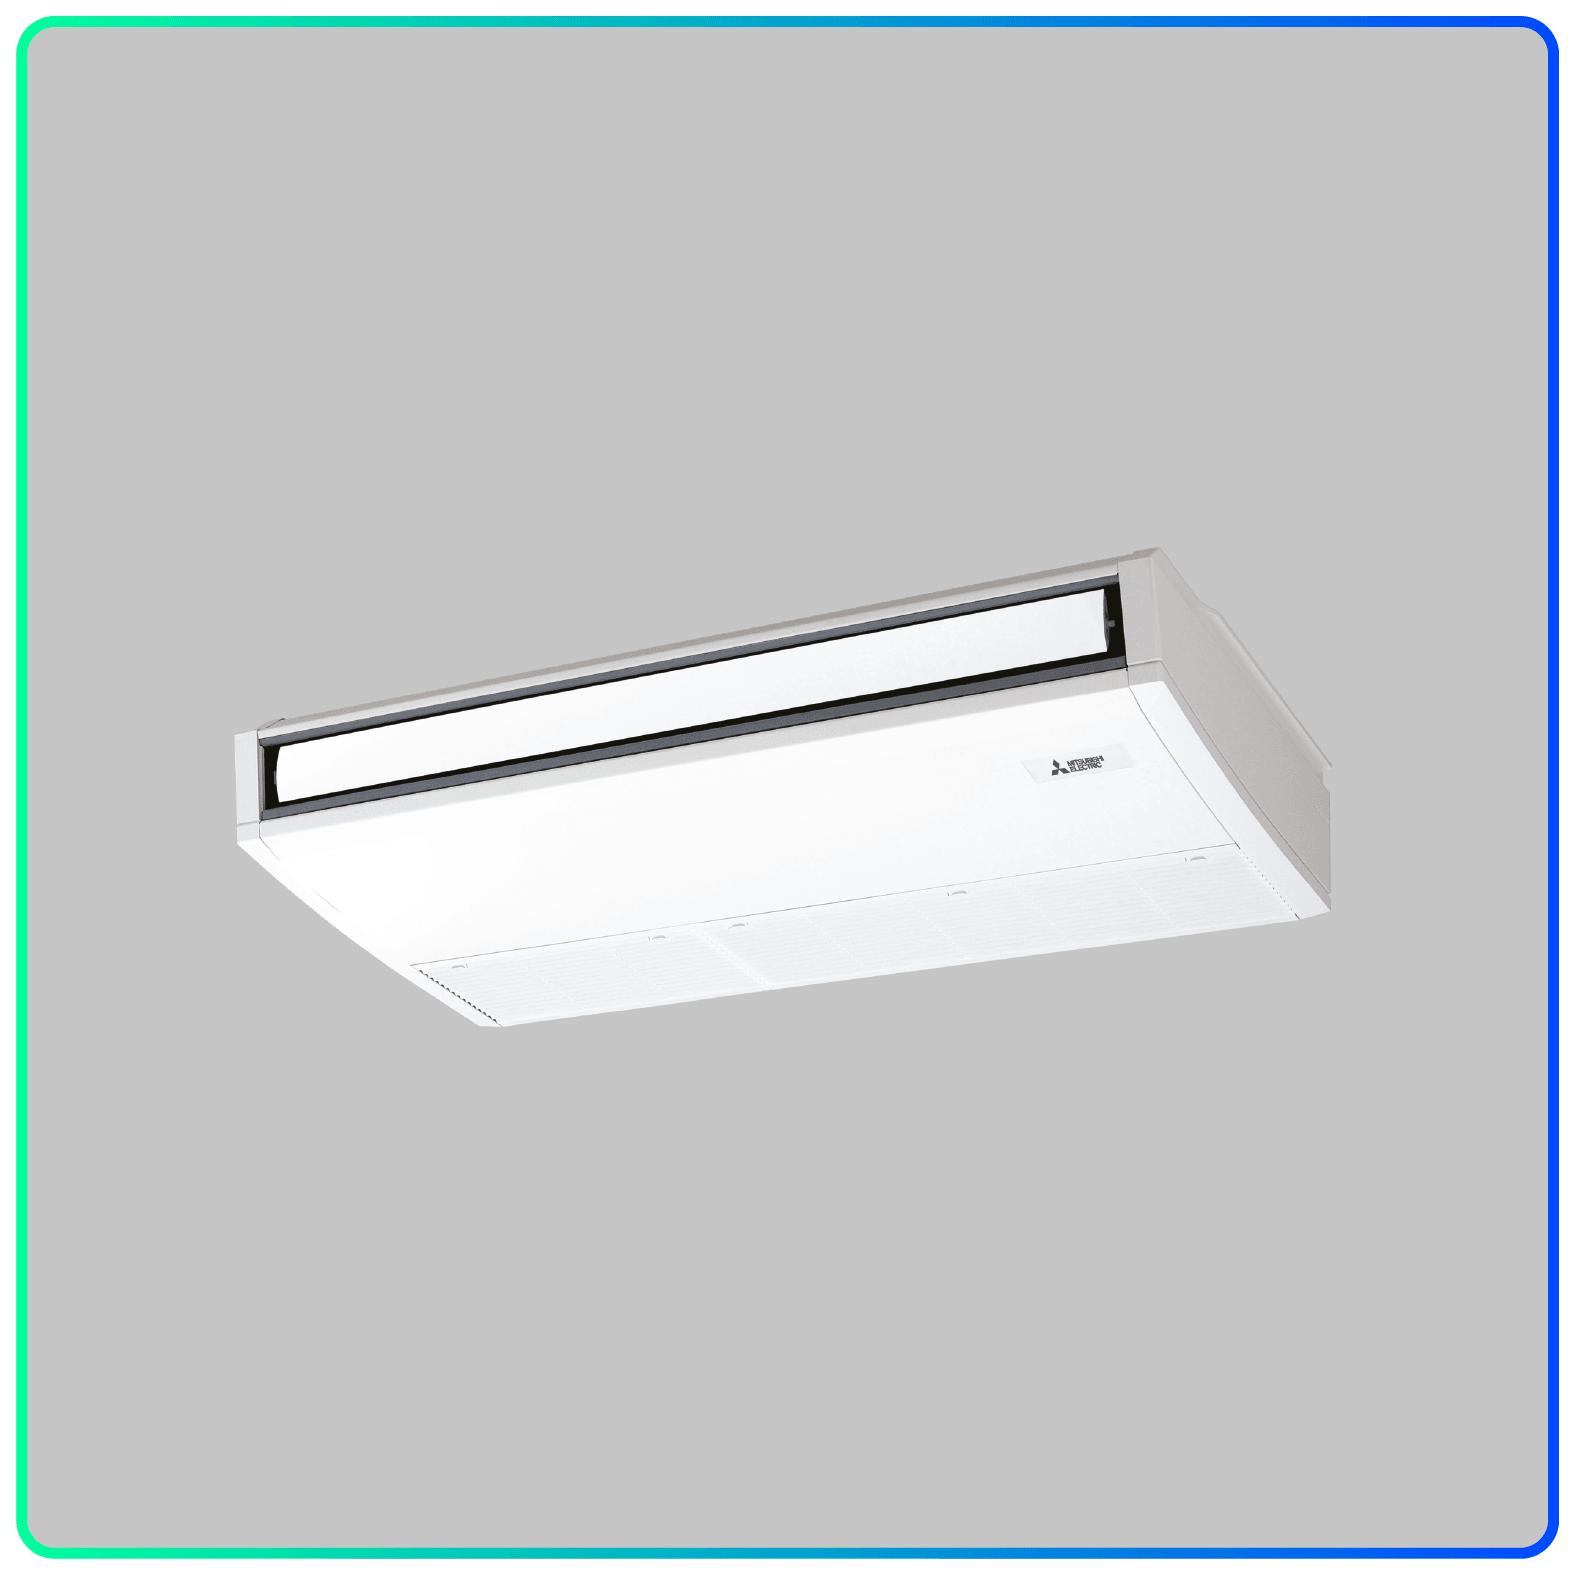 Plafond-unit(s)